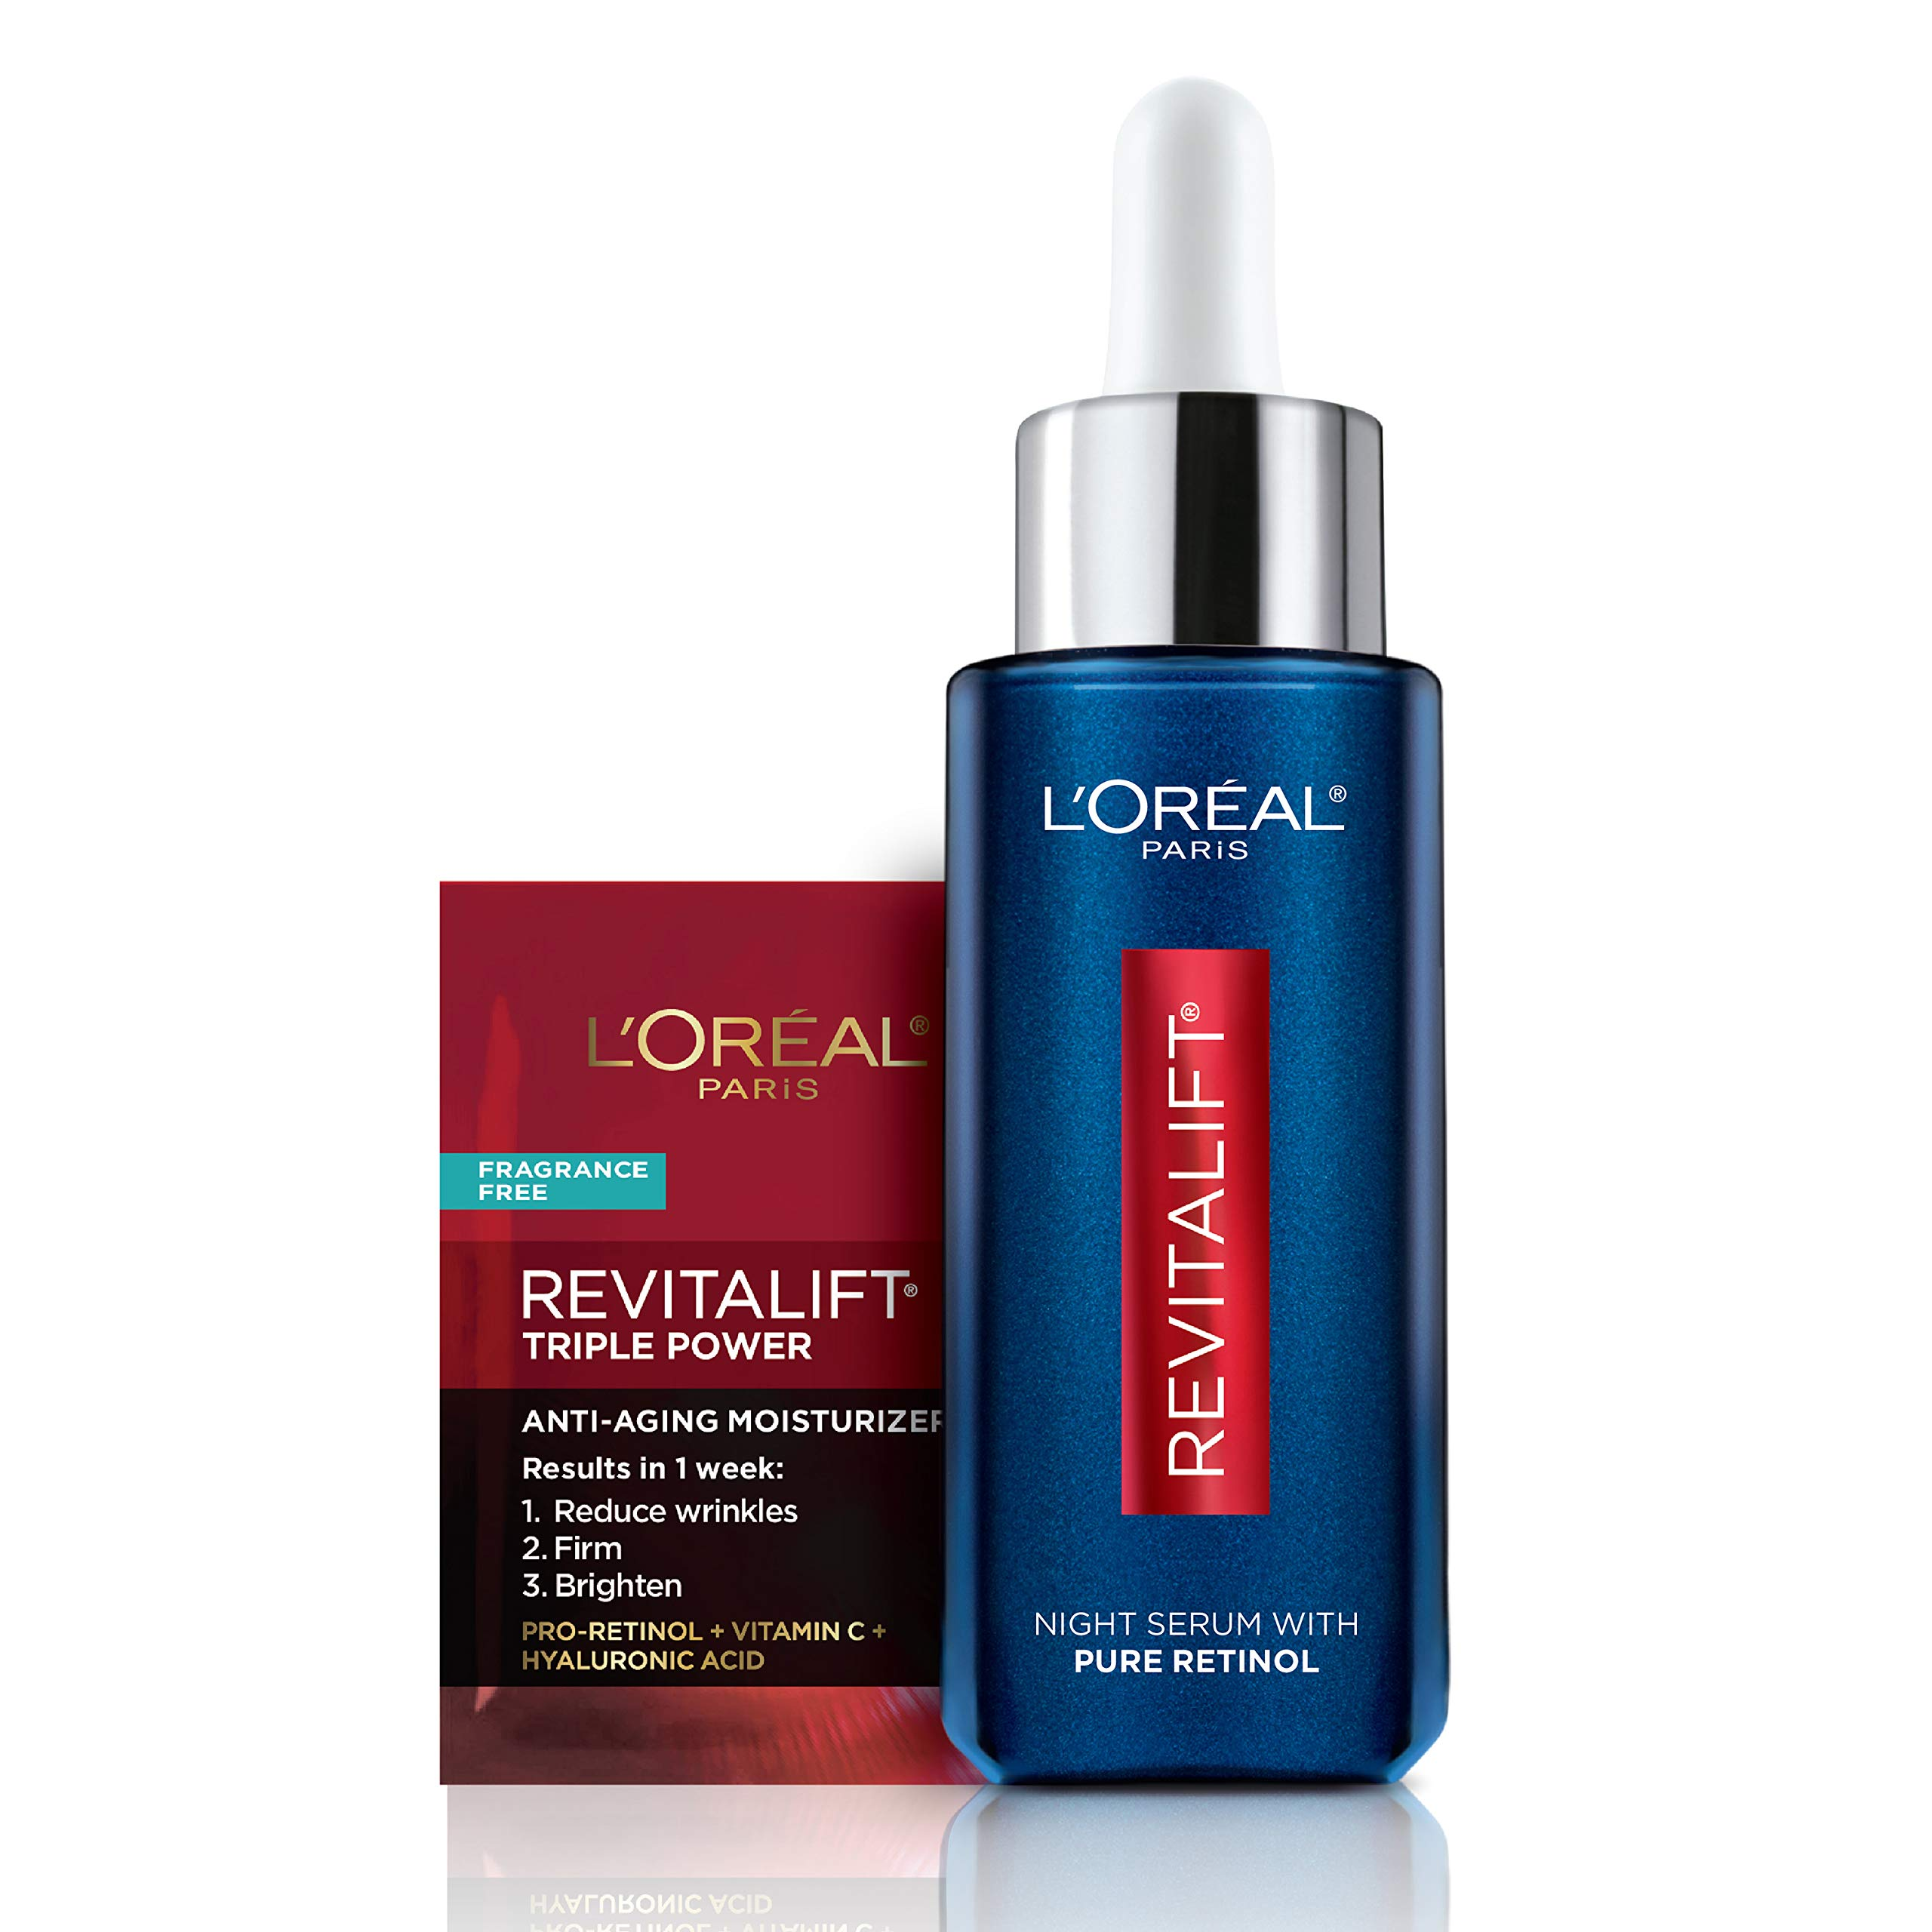 L'Oreal Paris Revitalift Derm Intensives Night Serum, Retinol Serum for Face, 0.3% Pure Retinol, Visibly Reduce Wrinkles, Even Deep Ones, 1 fl oz Serum + Moisturizer Cream Samples, Packaging May Vary